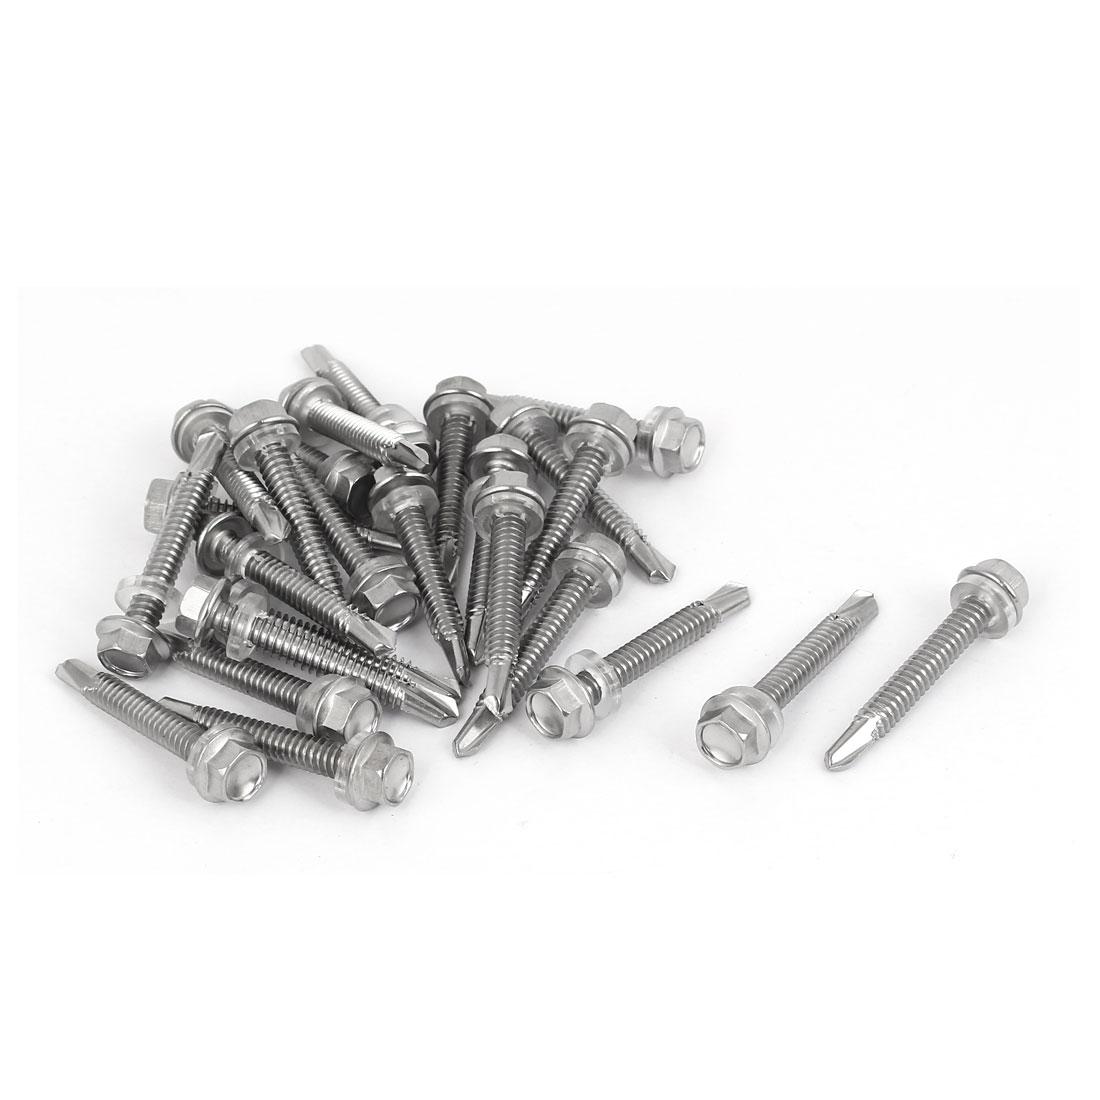 M5.5 x 38mm Male Thread Stainless Steel Self Drilling Tek Screw w Washer 25 Pcs